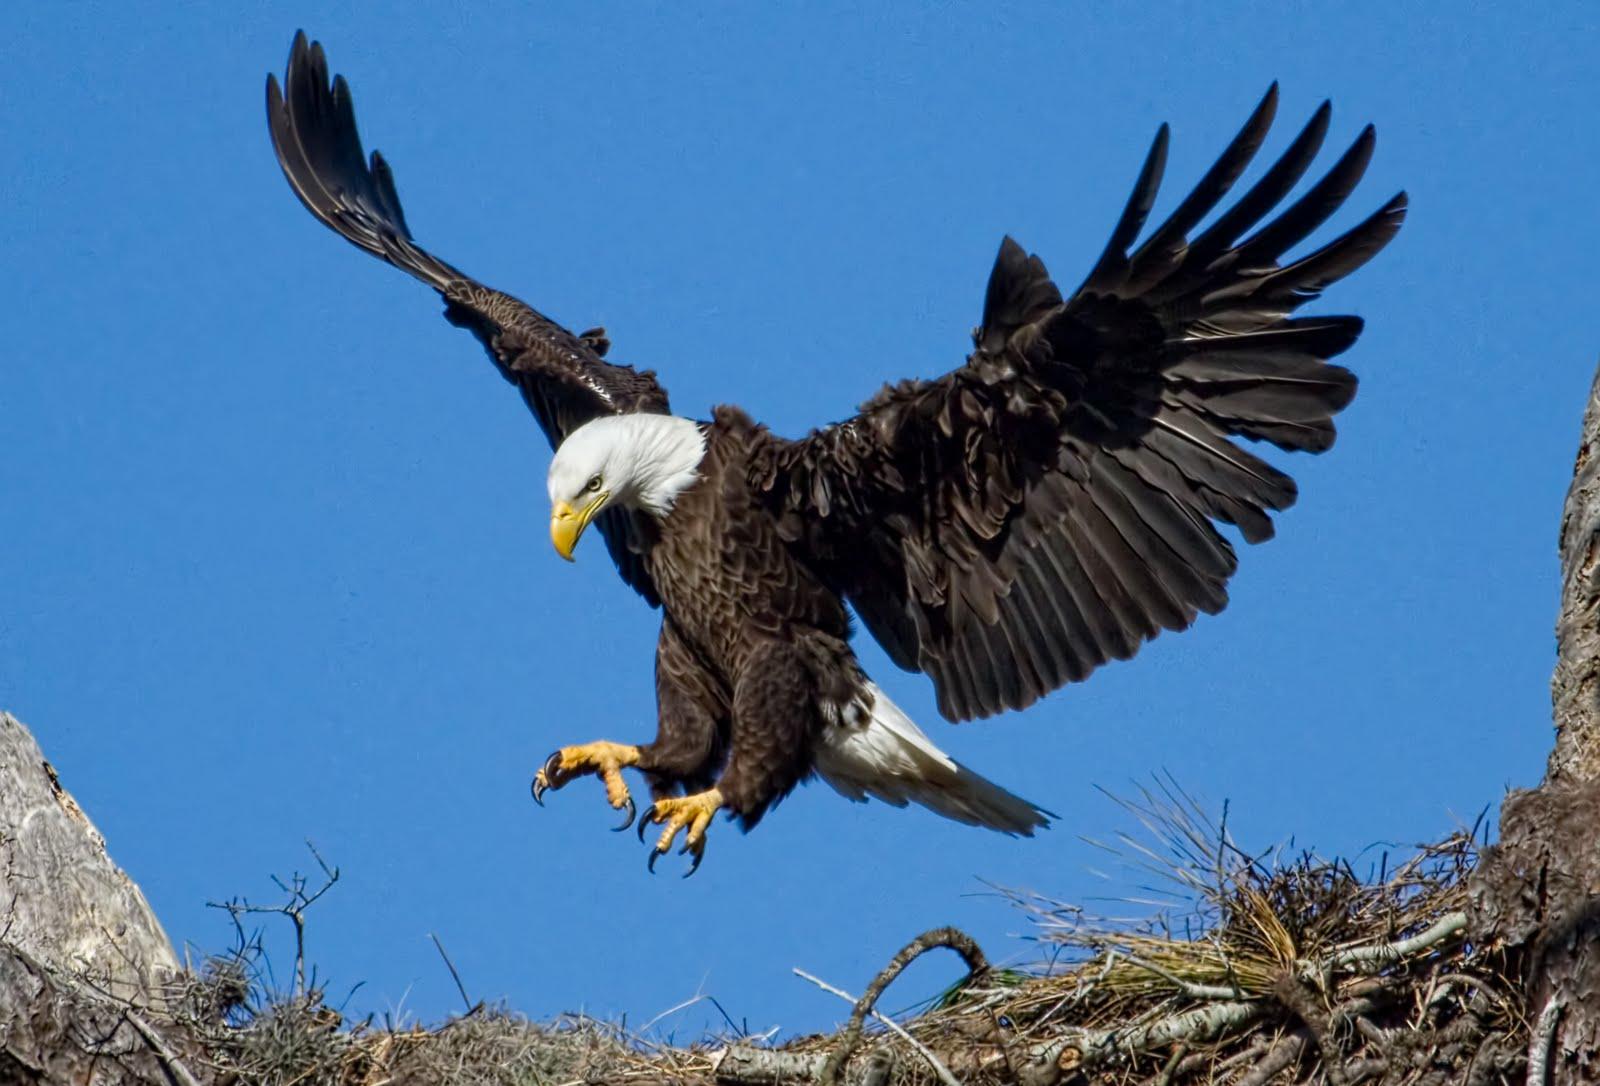 eagle-stunning-hd-wallpaper.jpg